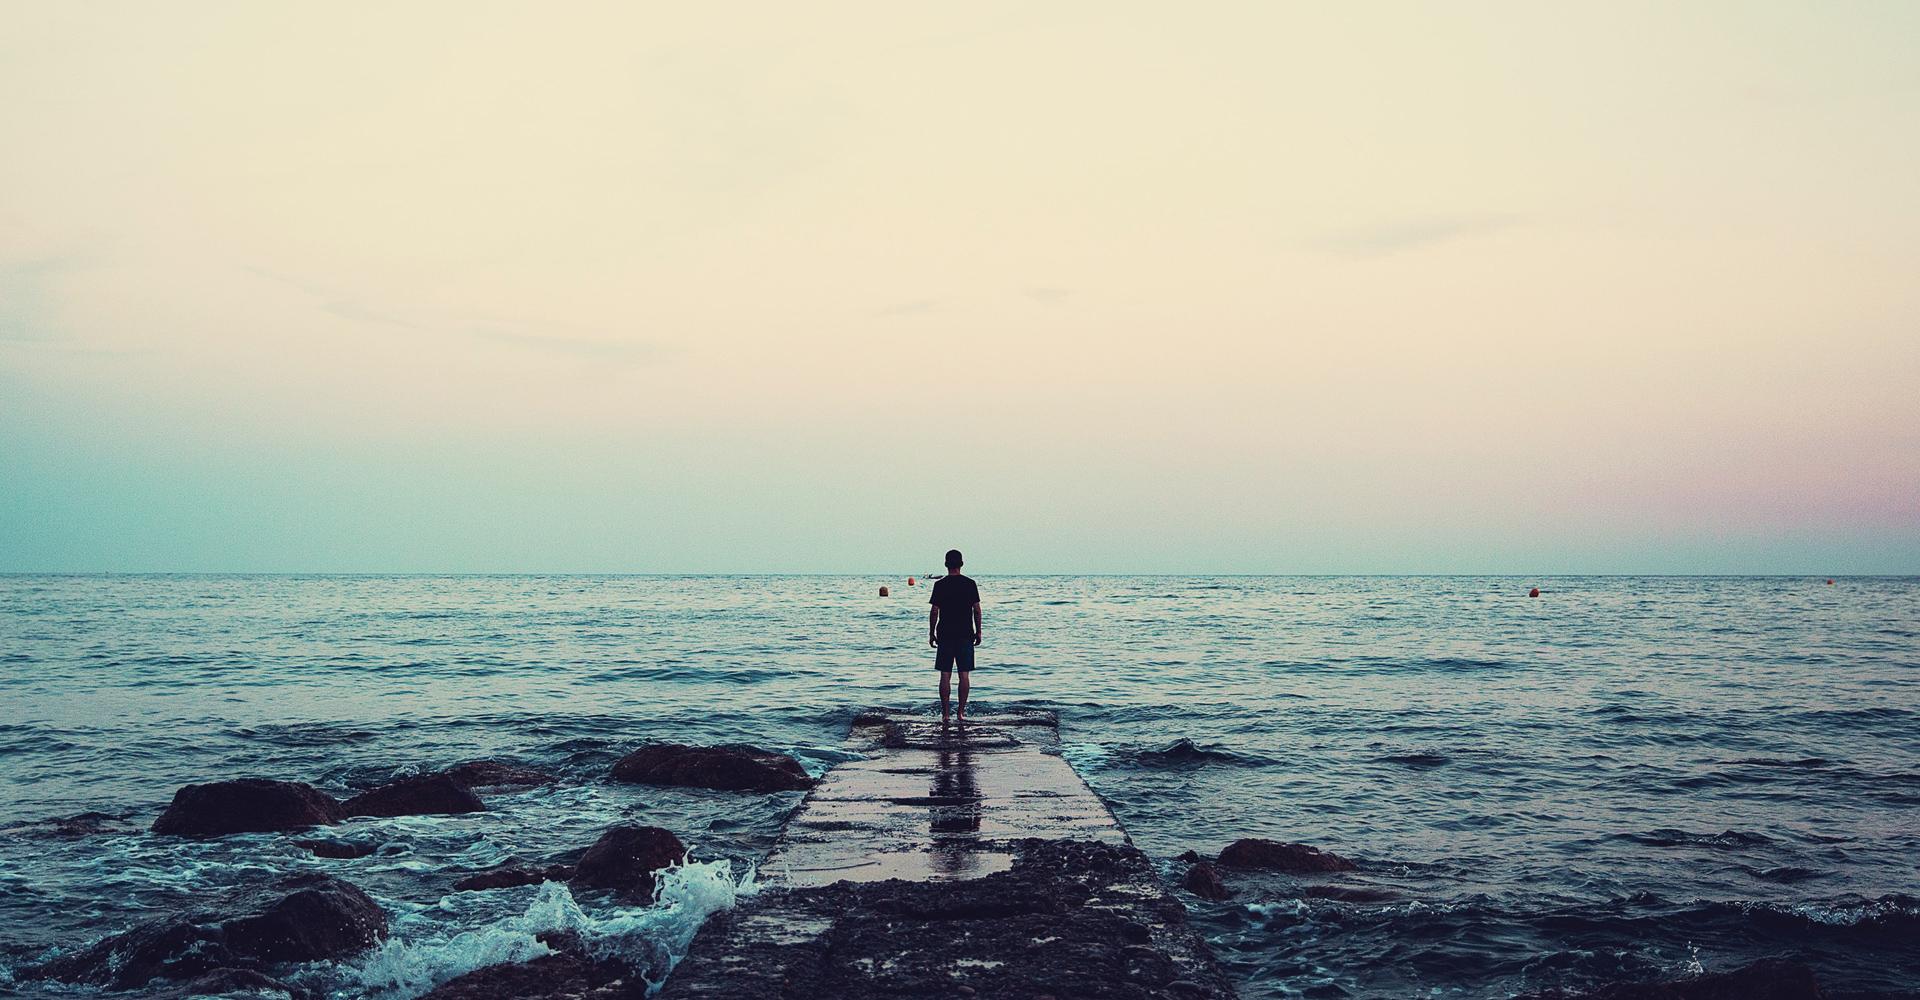 Fighting Unpredictable Existential Threats | Avast